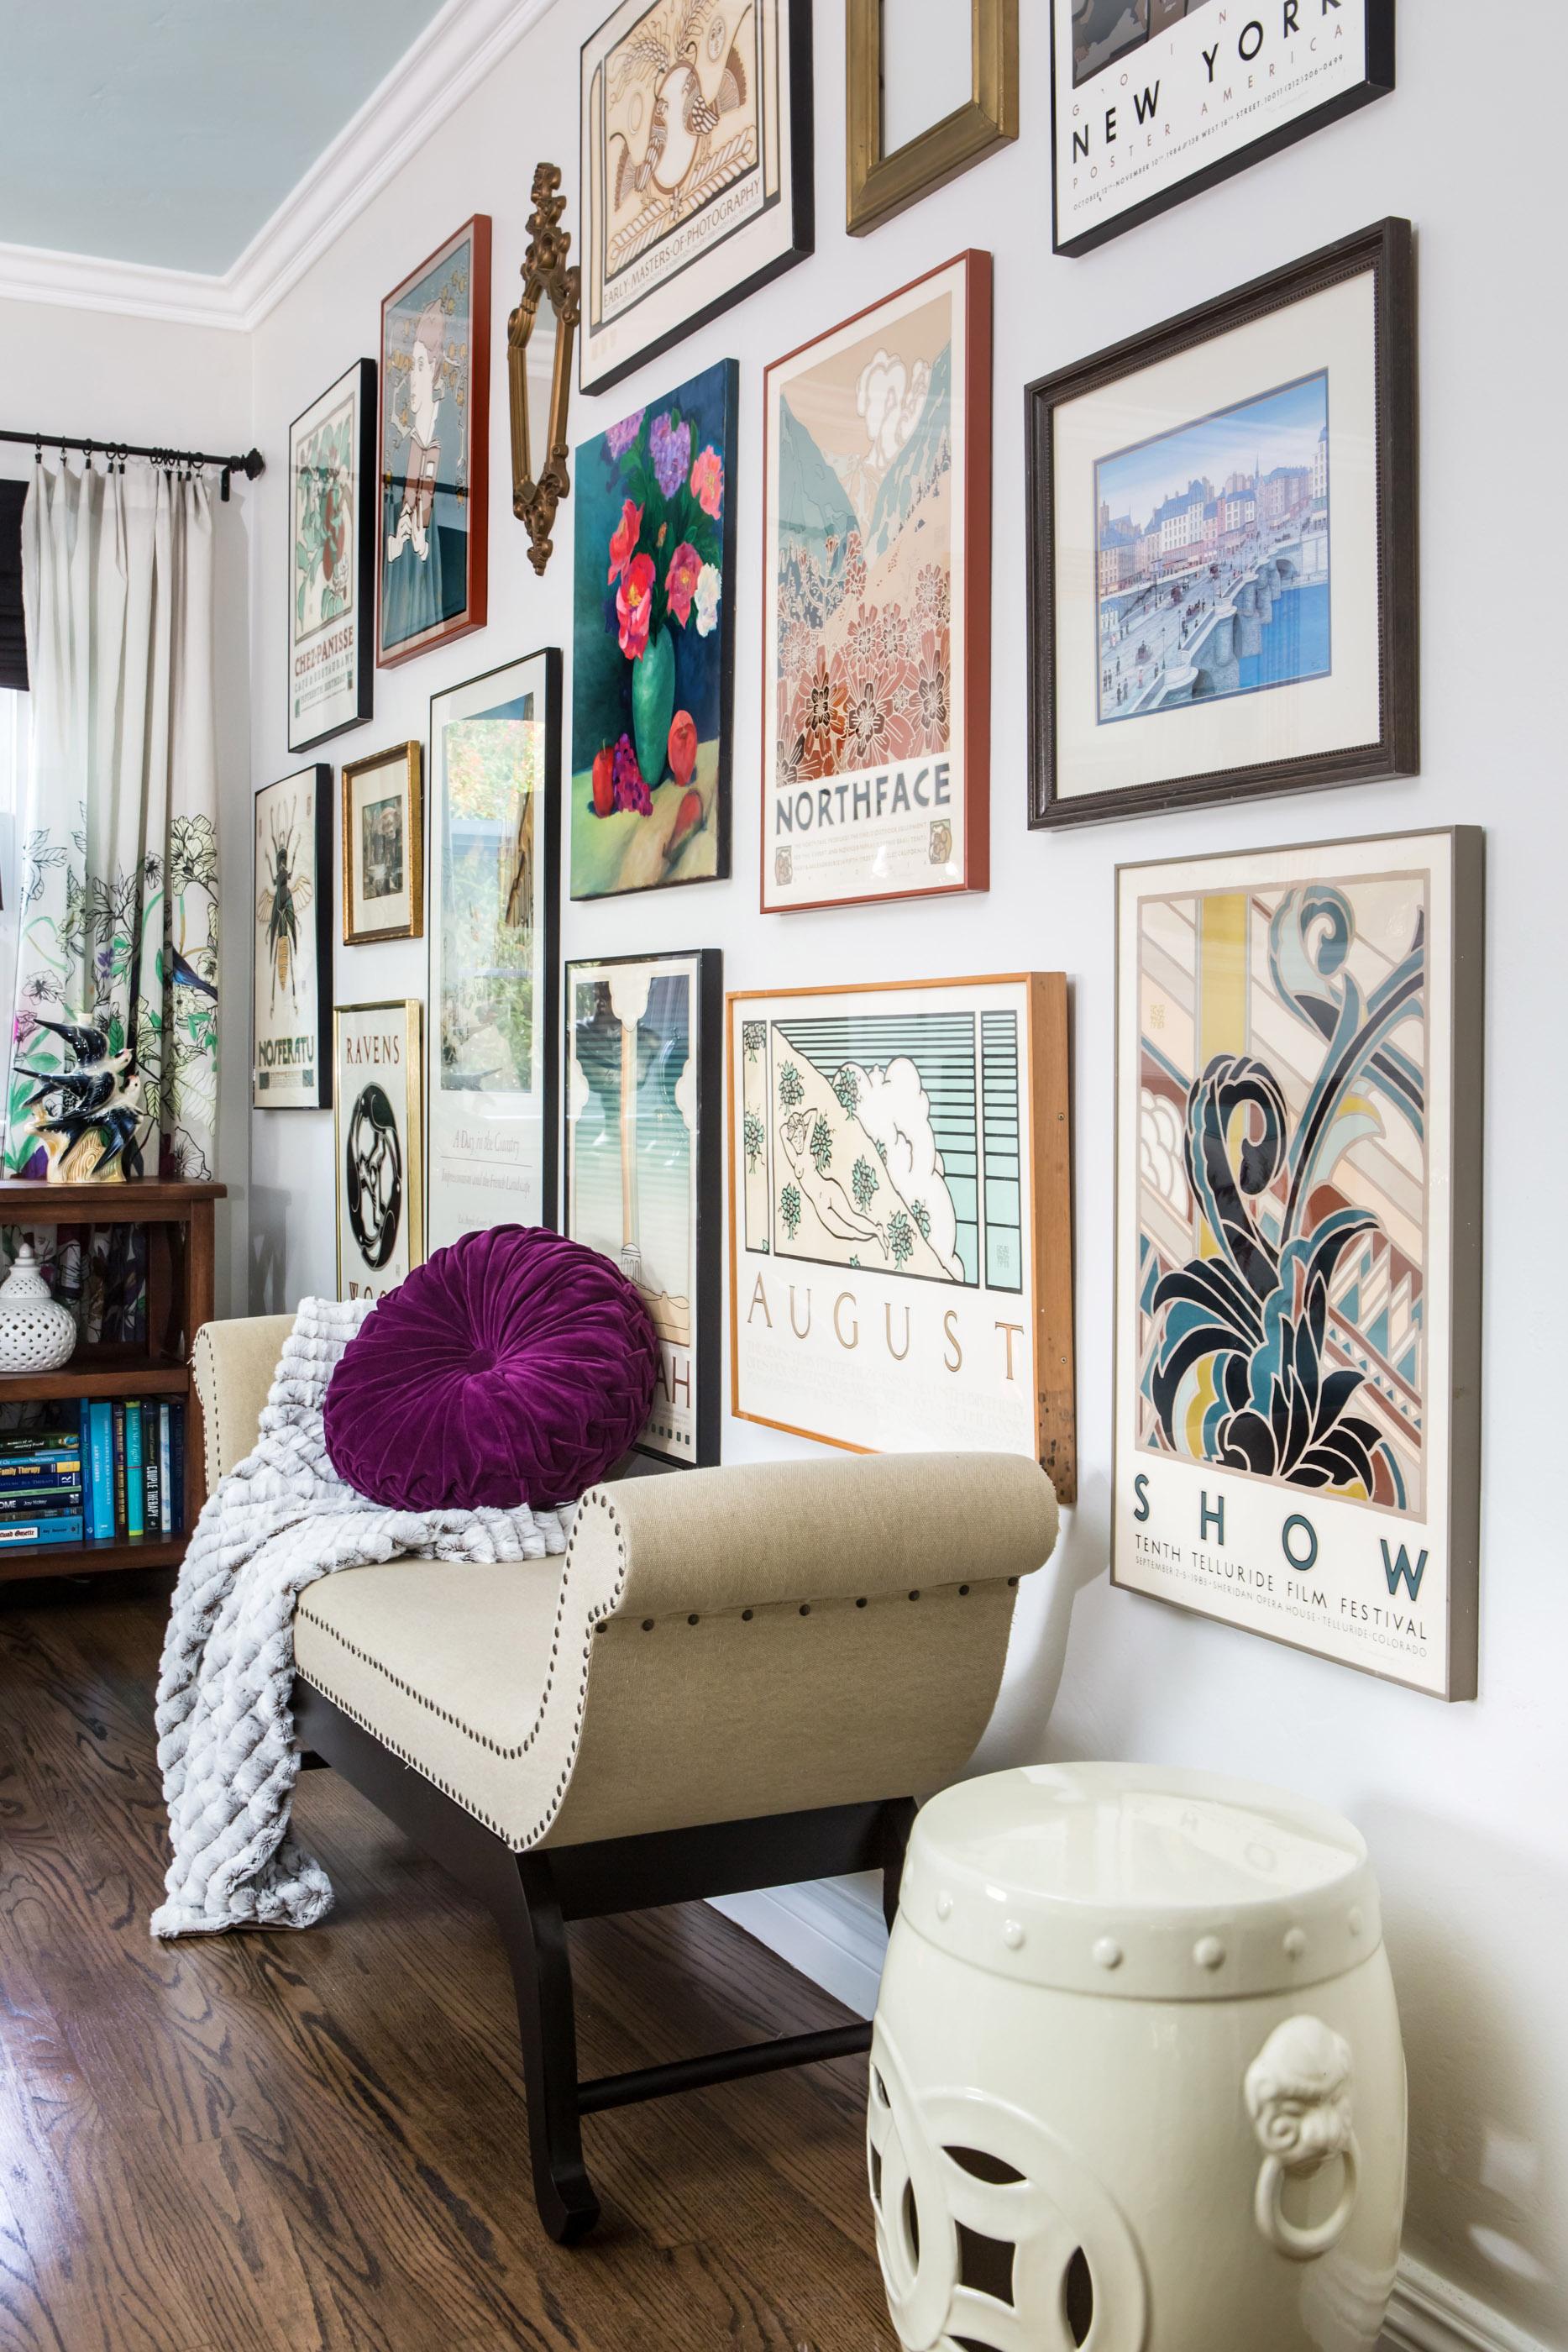 Marilyn Taylor, Marilynn Taylor, Mercedes, purple, art wall, Pantone, 2018, color of the year, purple, violet, interior design, interiors